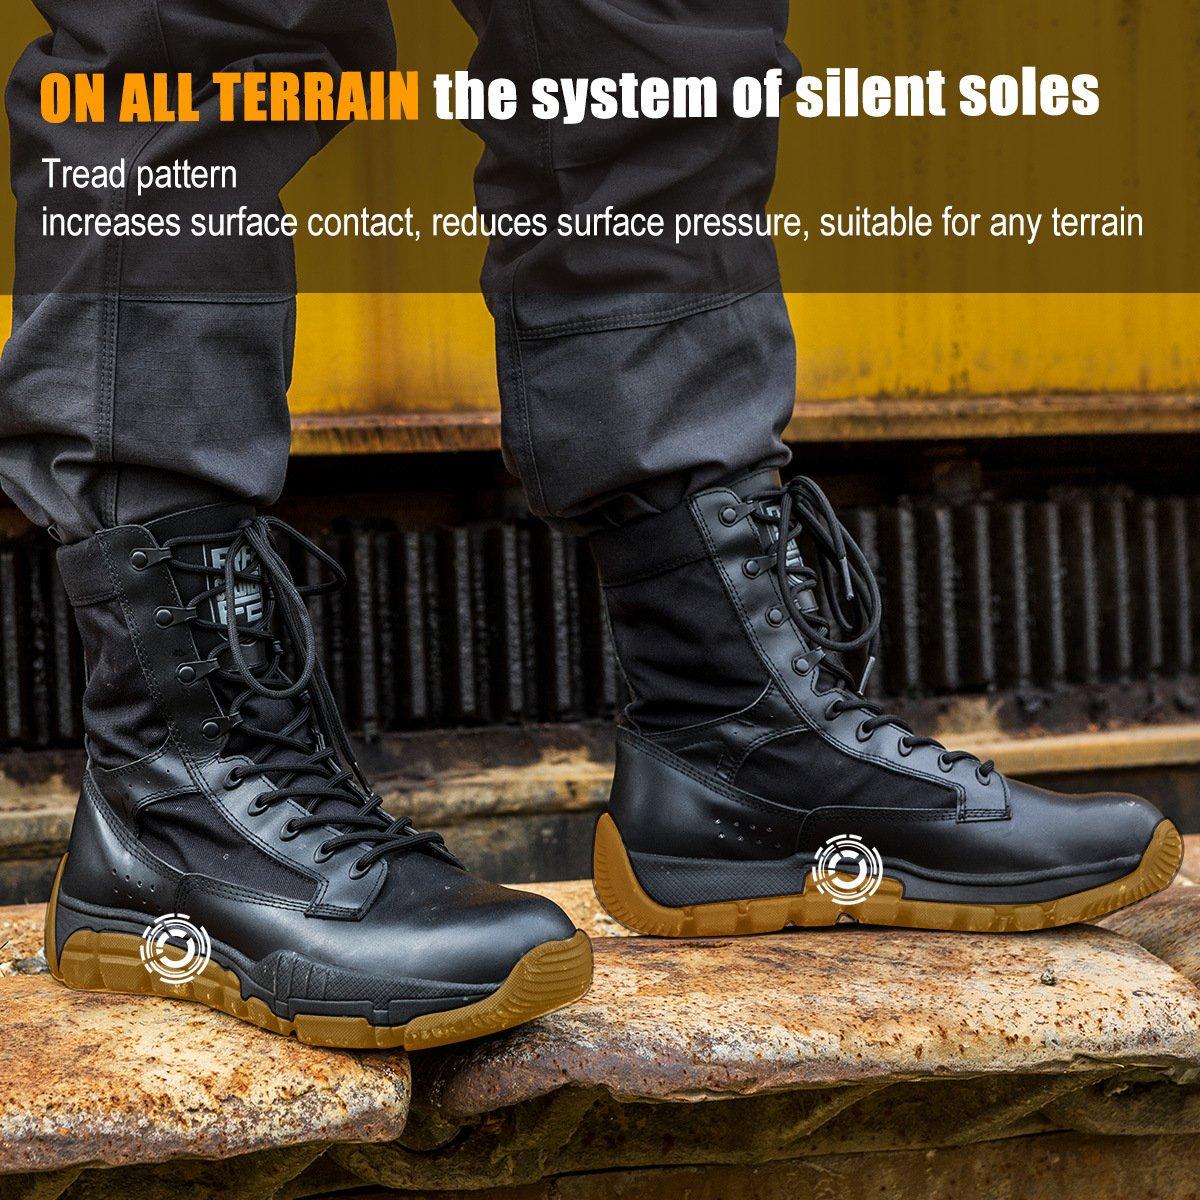 FREESOLDIER Soldier Free Soldier FREESOLDIER Military Herren Patrol Arbeit Wandern Stiefel Tactical Stellar Schuhe Leder Desert Combat Stiefel edafac